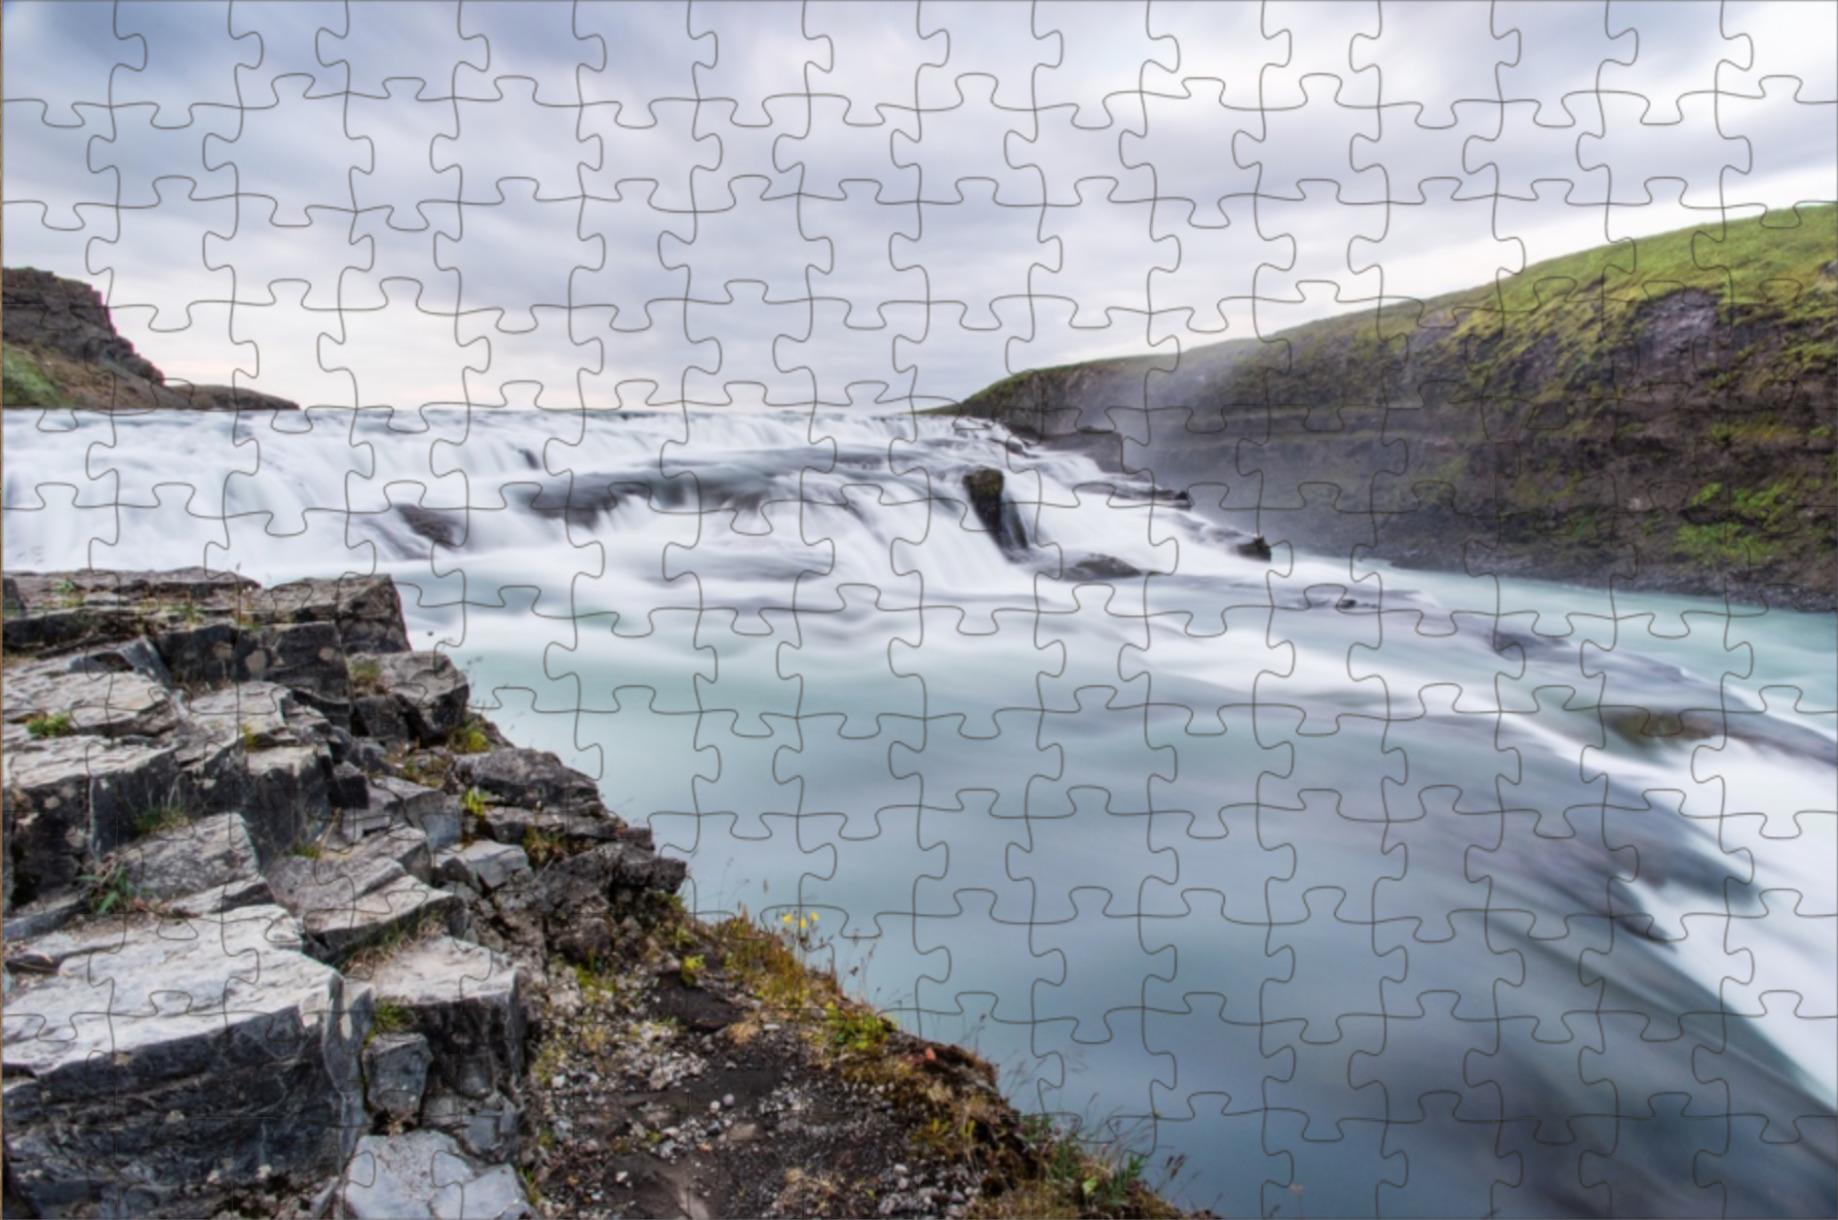 screenshot of a jigsaw puzzle